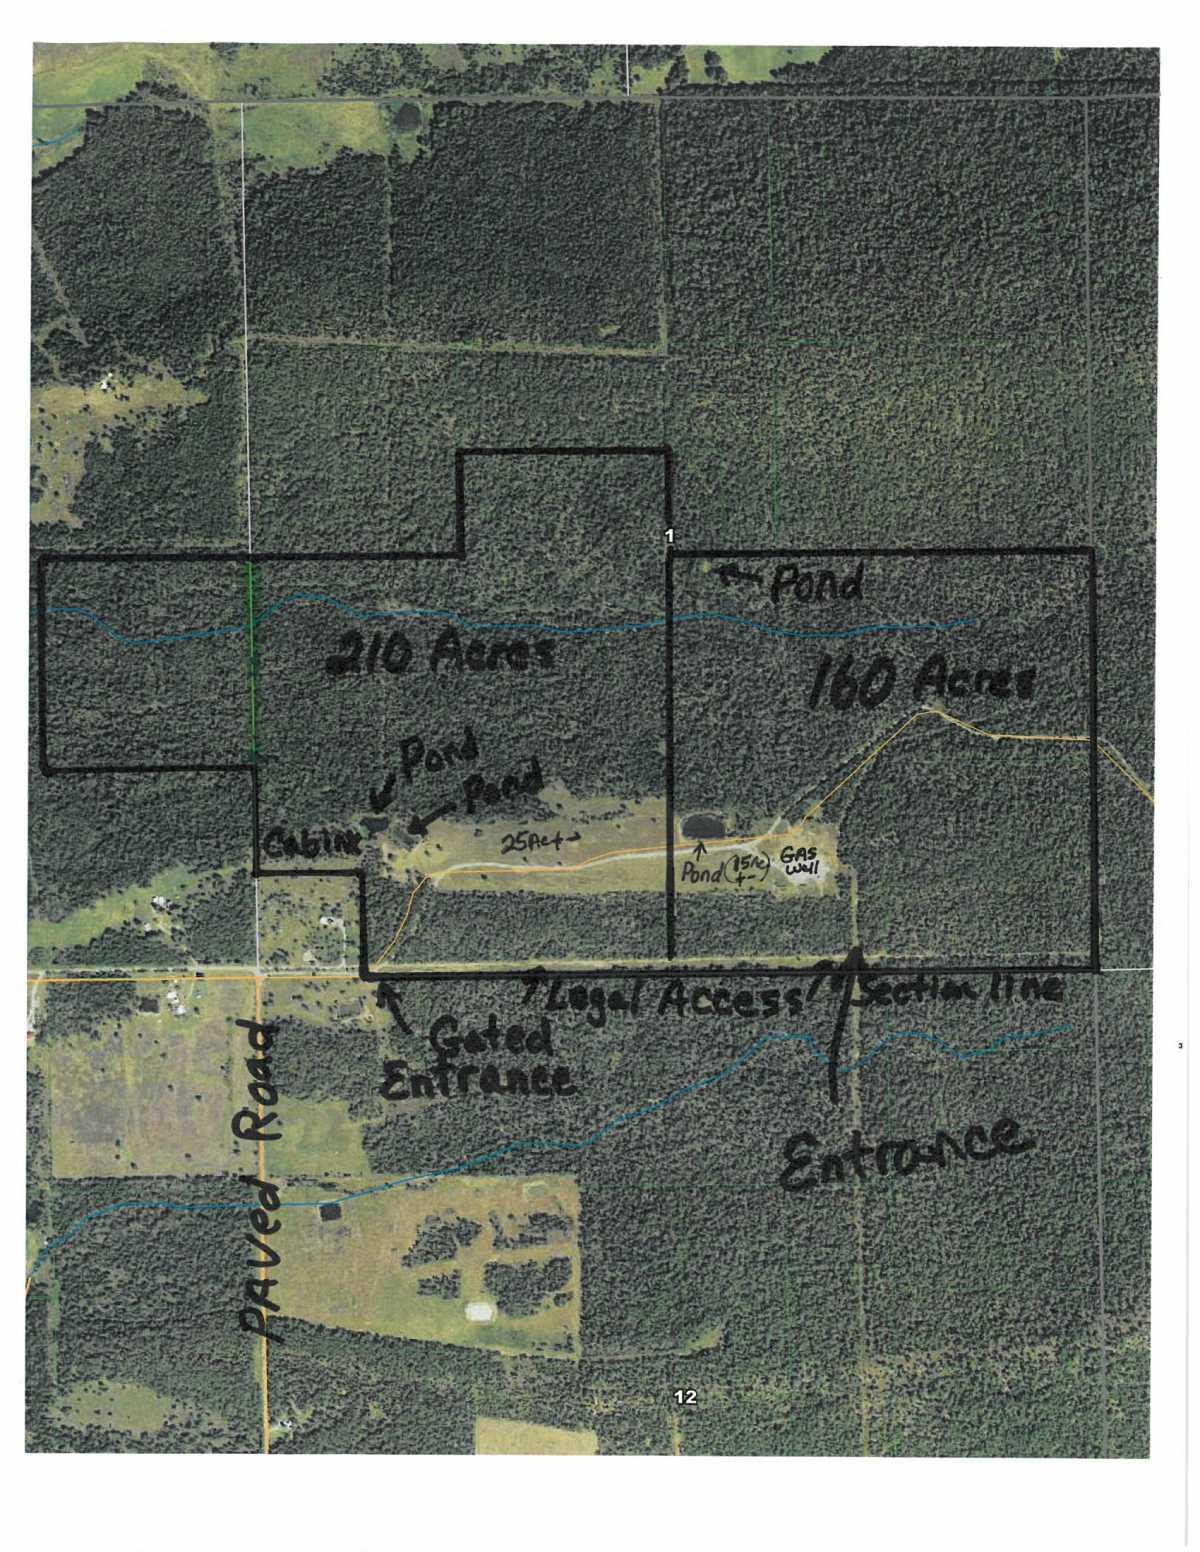 OKlahoma hunting land, Oklahoma Cabin, K hunting cabin ponds | Holsten Lane, 2022 Wilburton, OK 74578 0